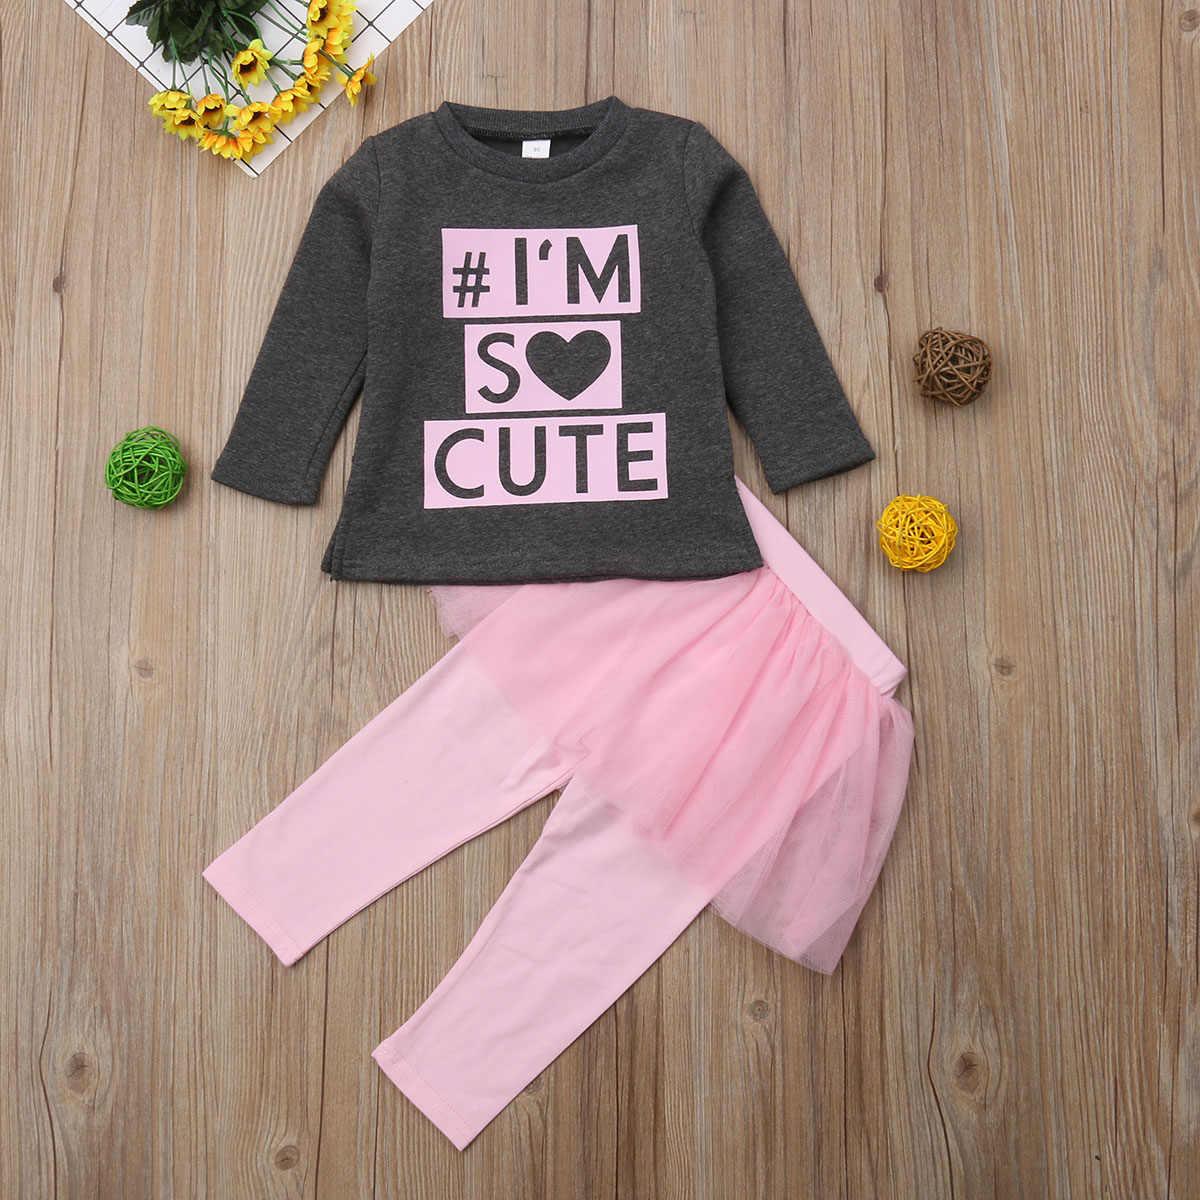 ccf7811171e9d Detail Feedback Questions about Kids Baby Girl Fleece Tops ...